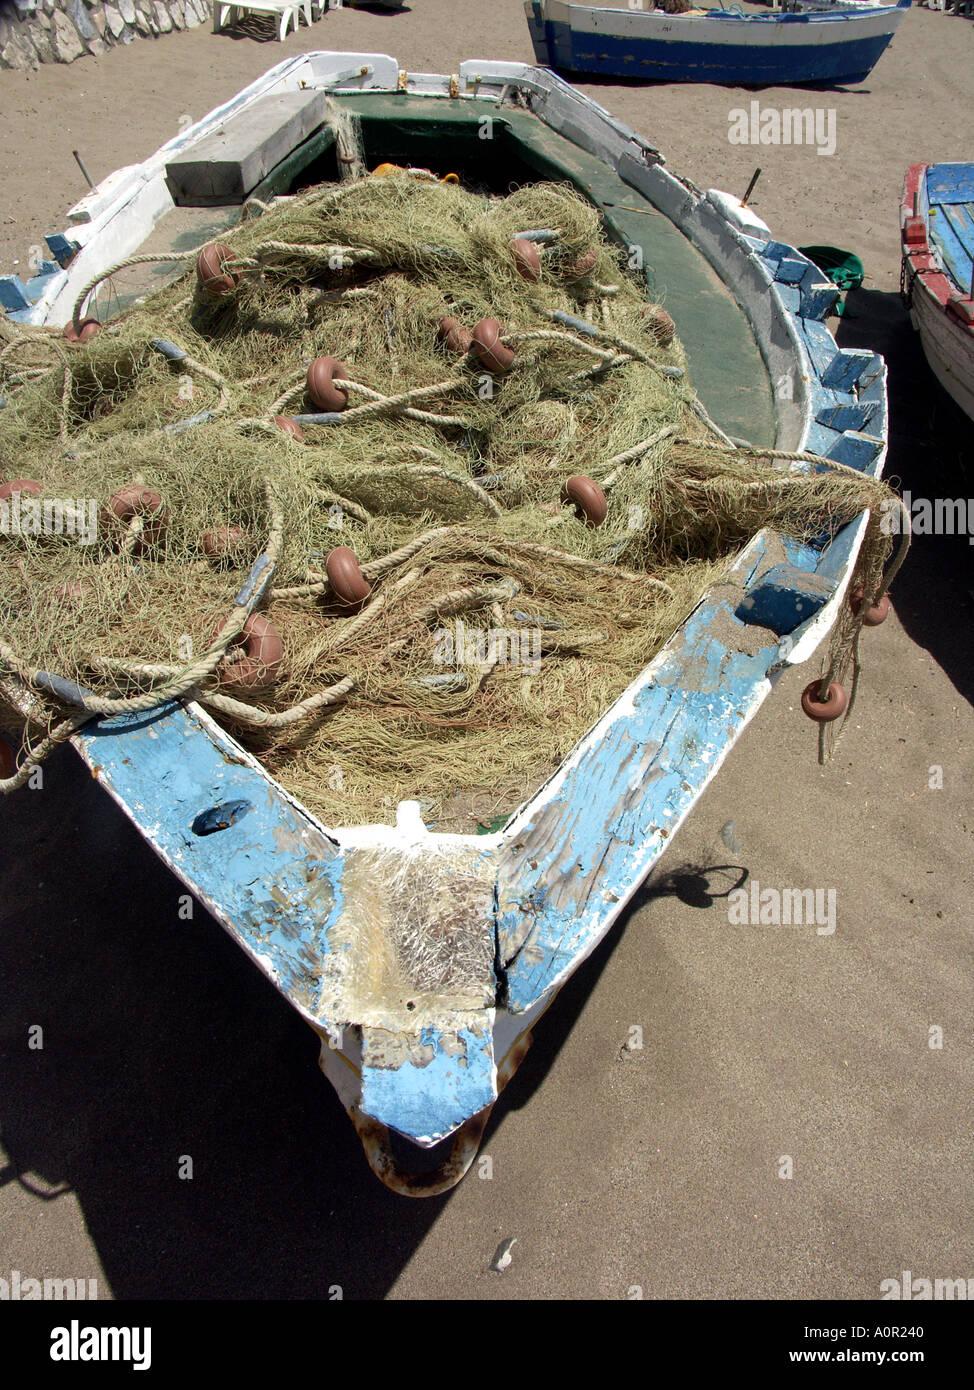 Wooden Fishing Boat, Fuengirola Port, Costa del Sol, Spain nets beach sand wood wooden  boat boats tackle net nets - Stock Image